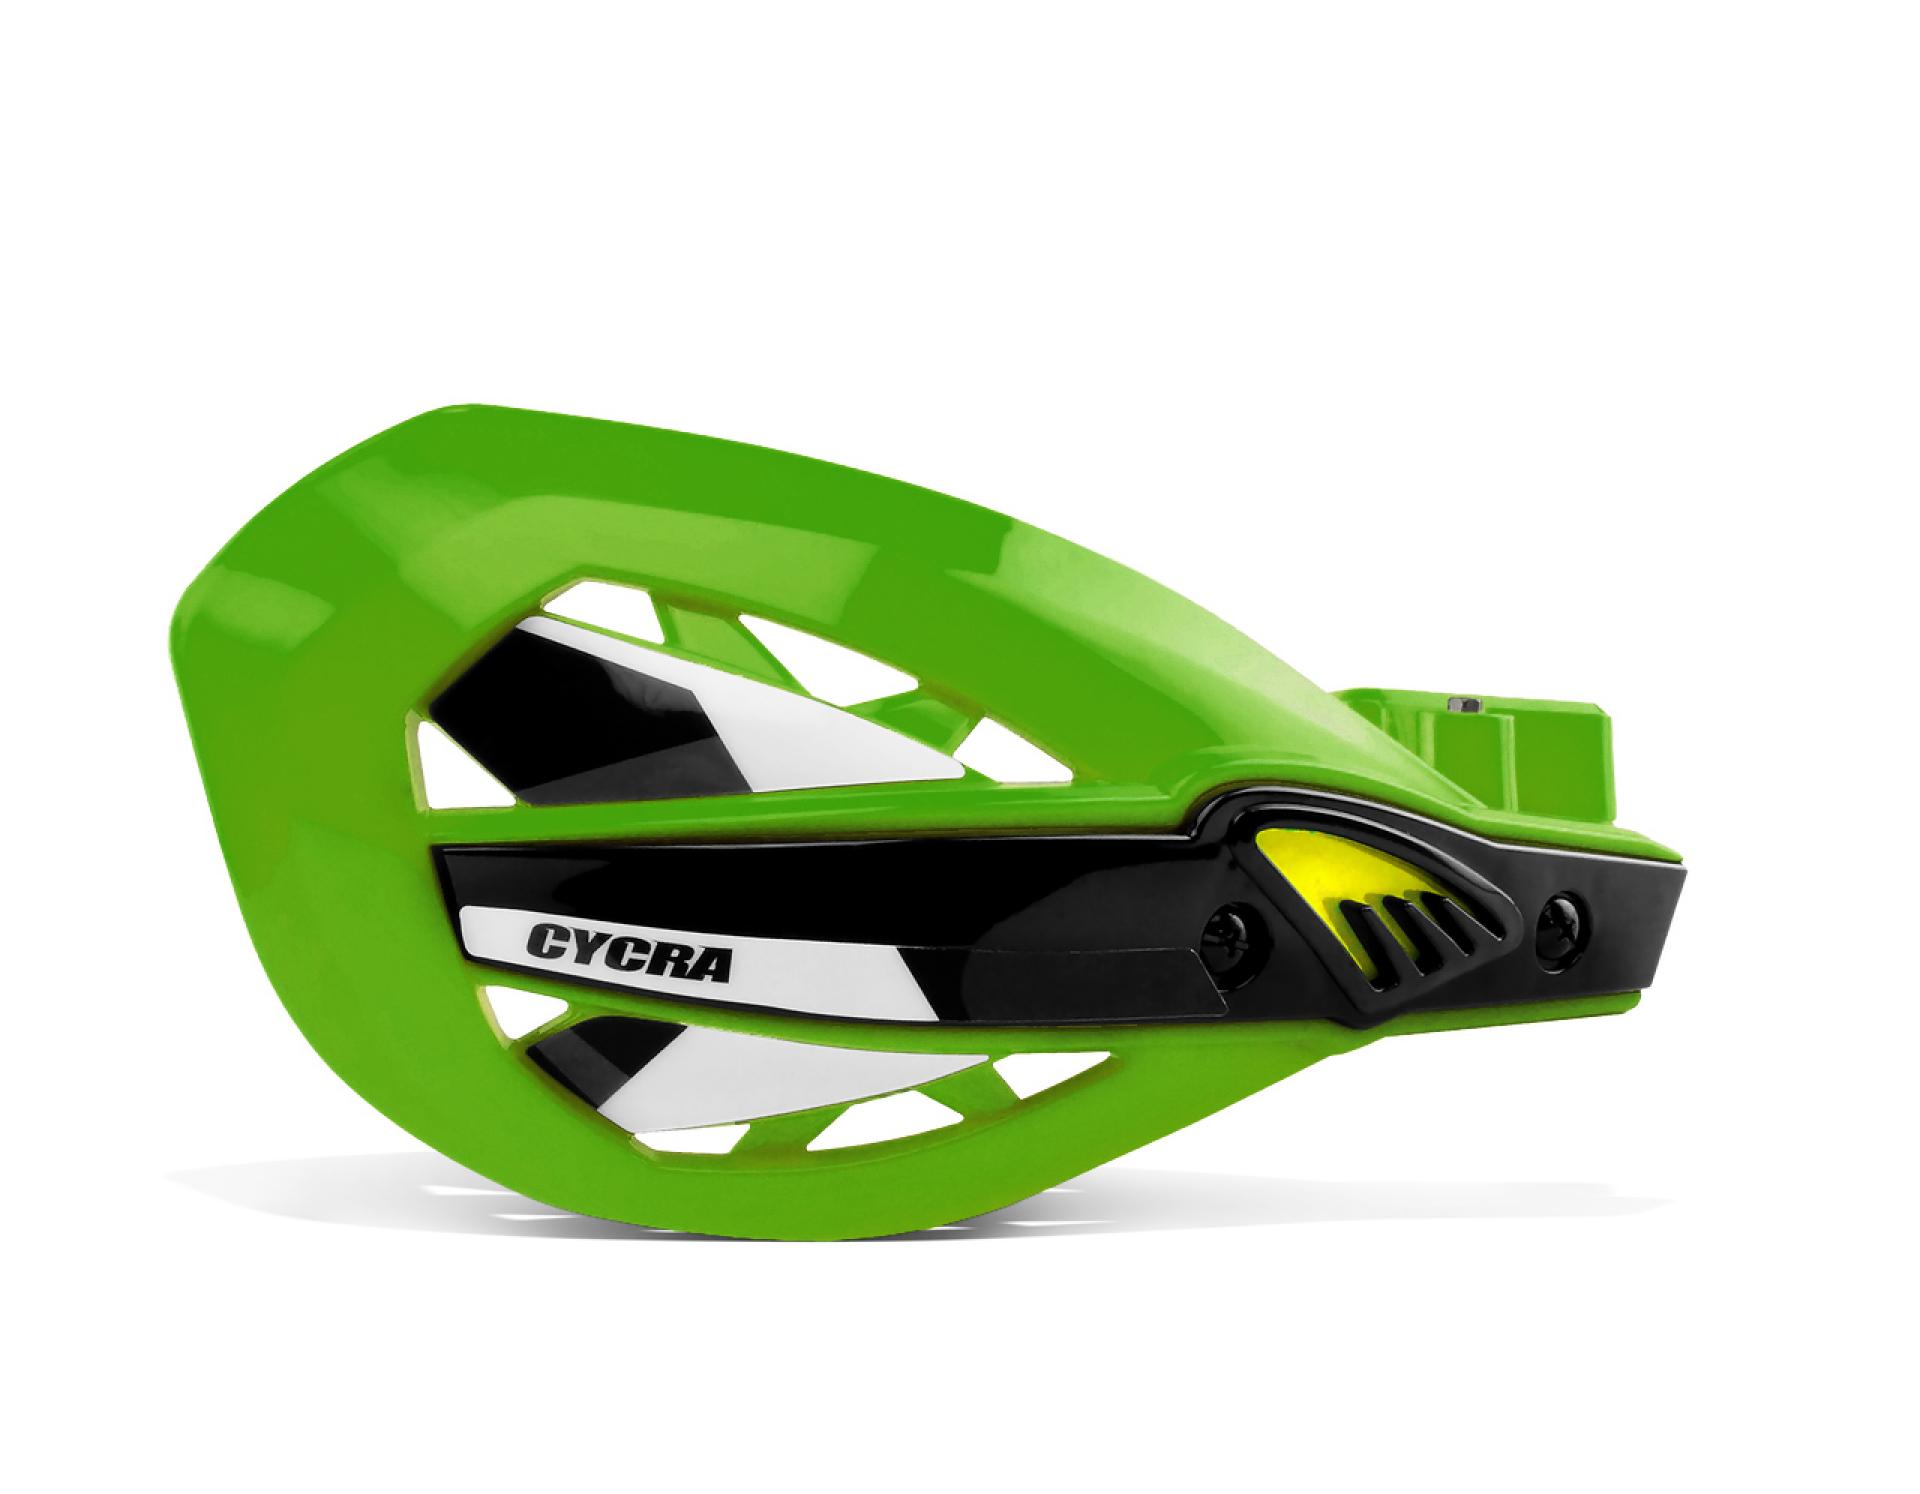 CYCRA サイクラ ECLIPSE (エクリプス) ハンドガードキット・Kawasaki 2016-2020用パーチマウント